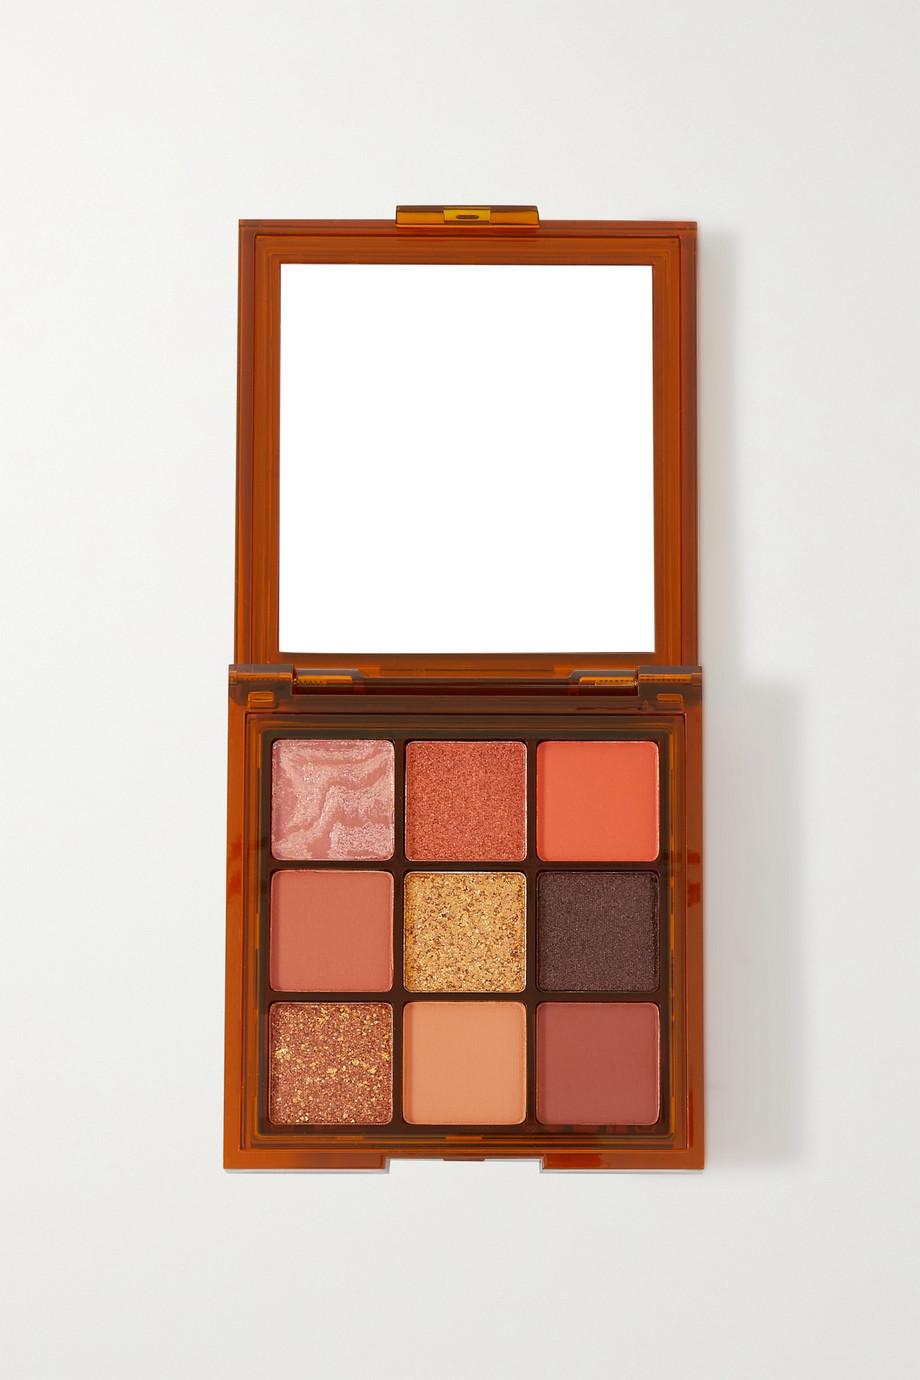 Huda Beauty Brown Obsessions Eyeshadow Palette - Caramel